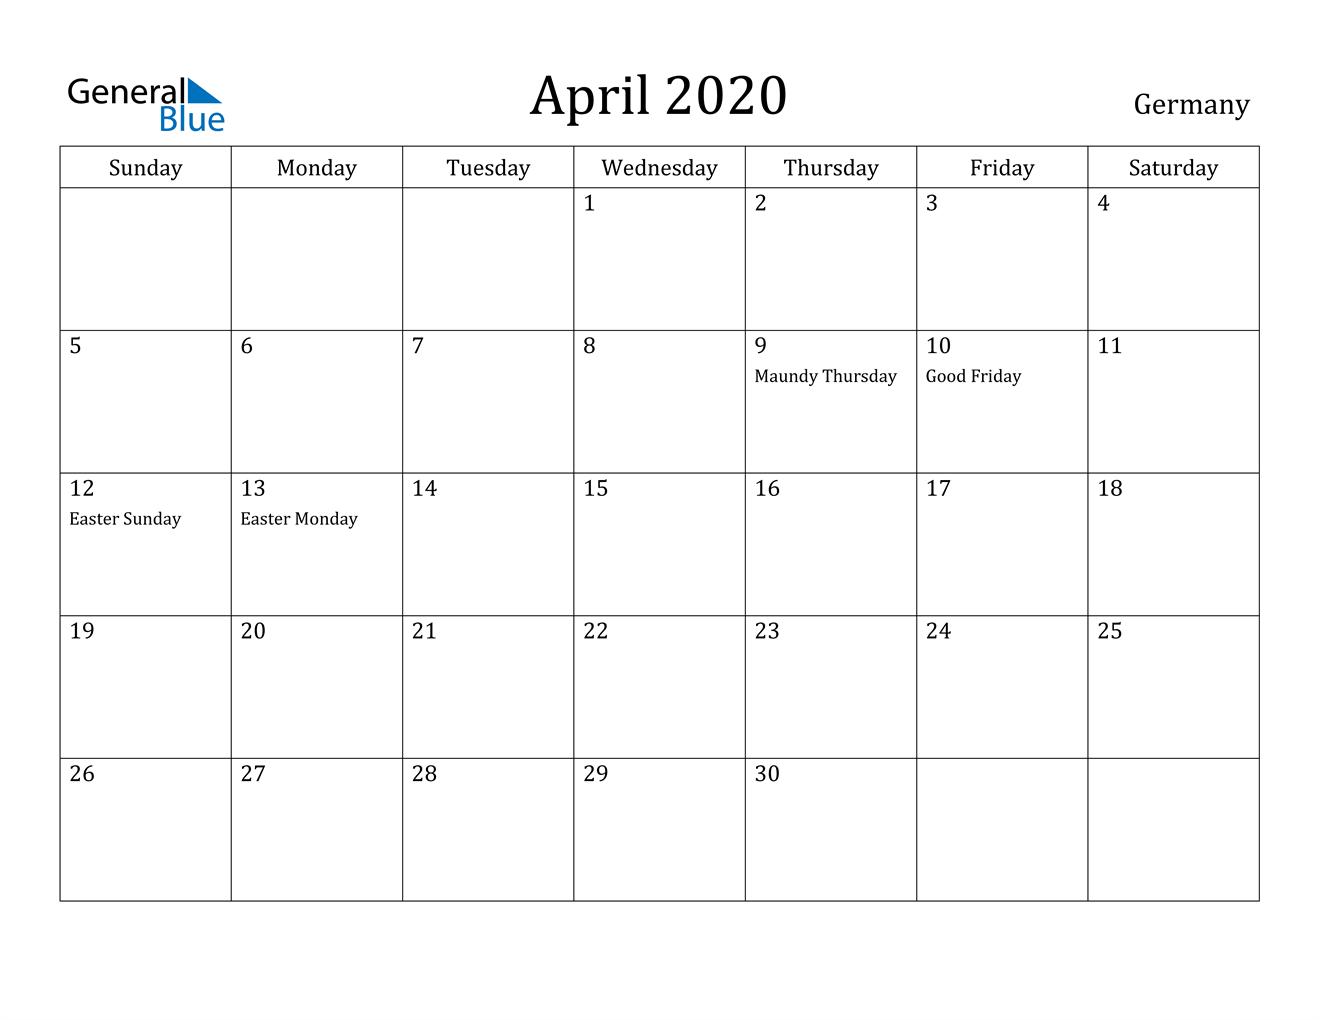 Image of April 2020 Germany Calendar with Holidays Calendar